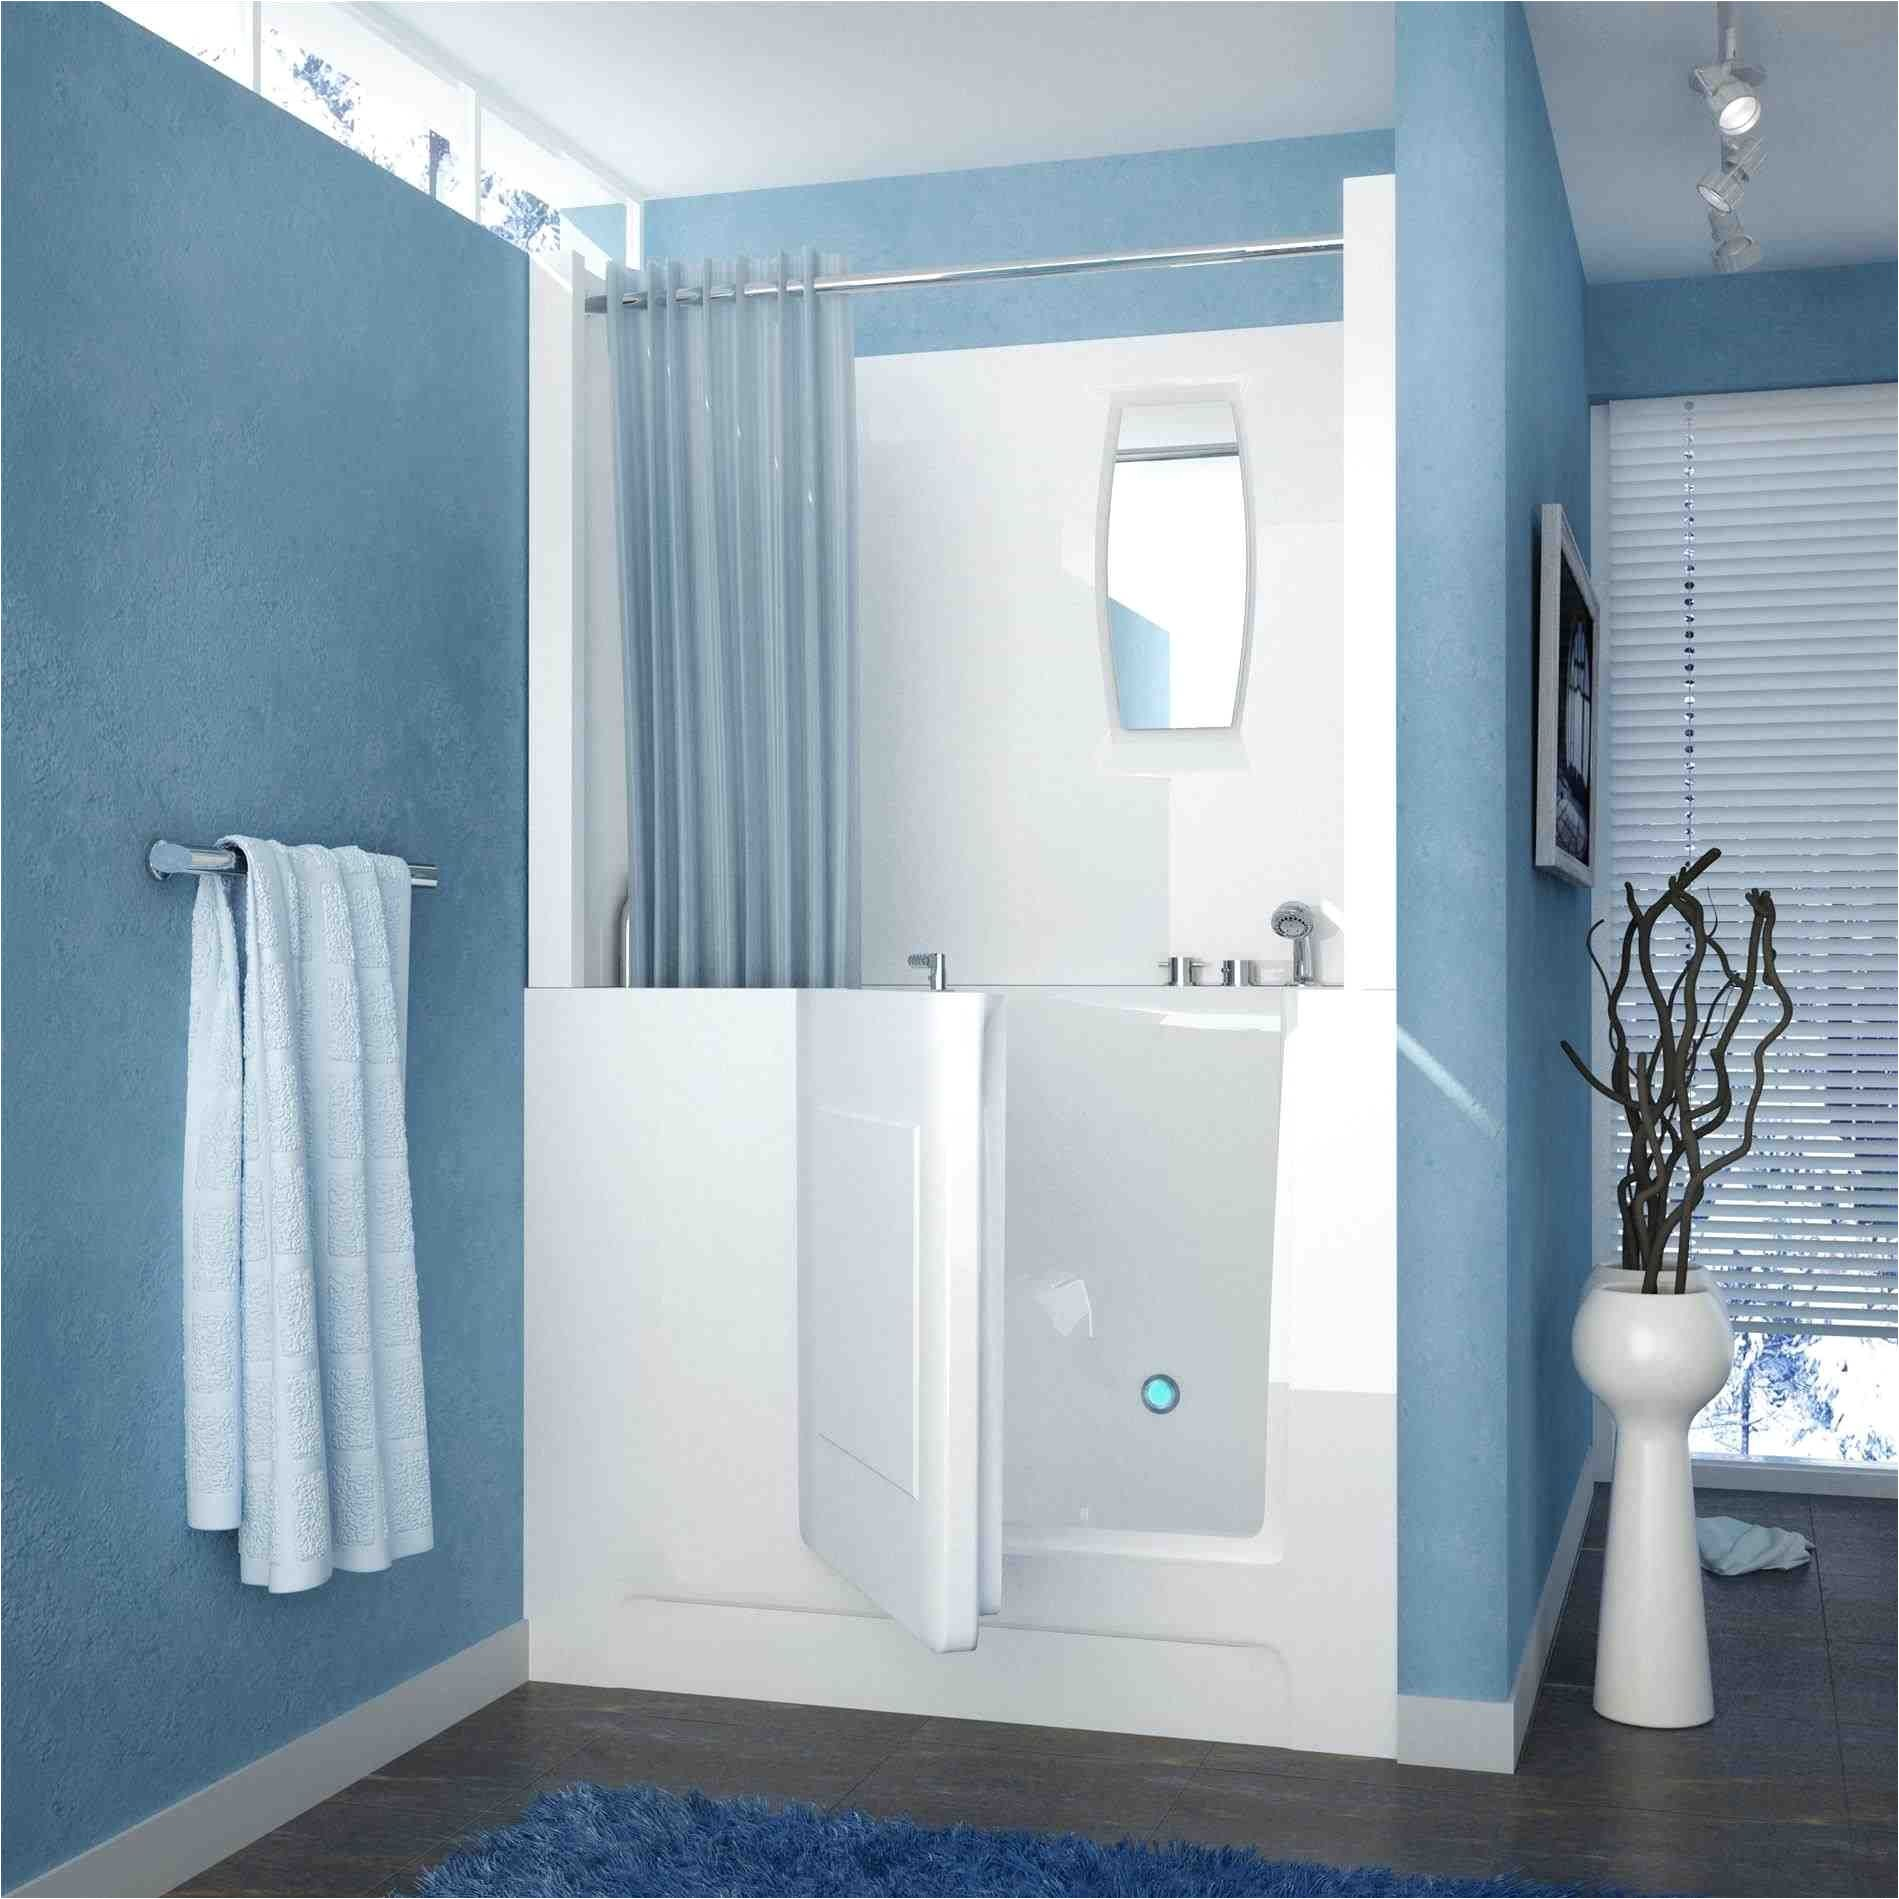 Best Of Shower Stalls at Menards | BradsHomeFurnishings